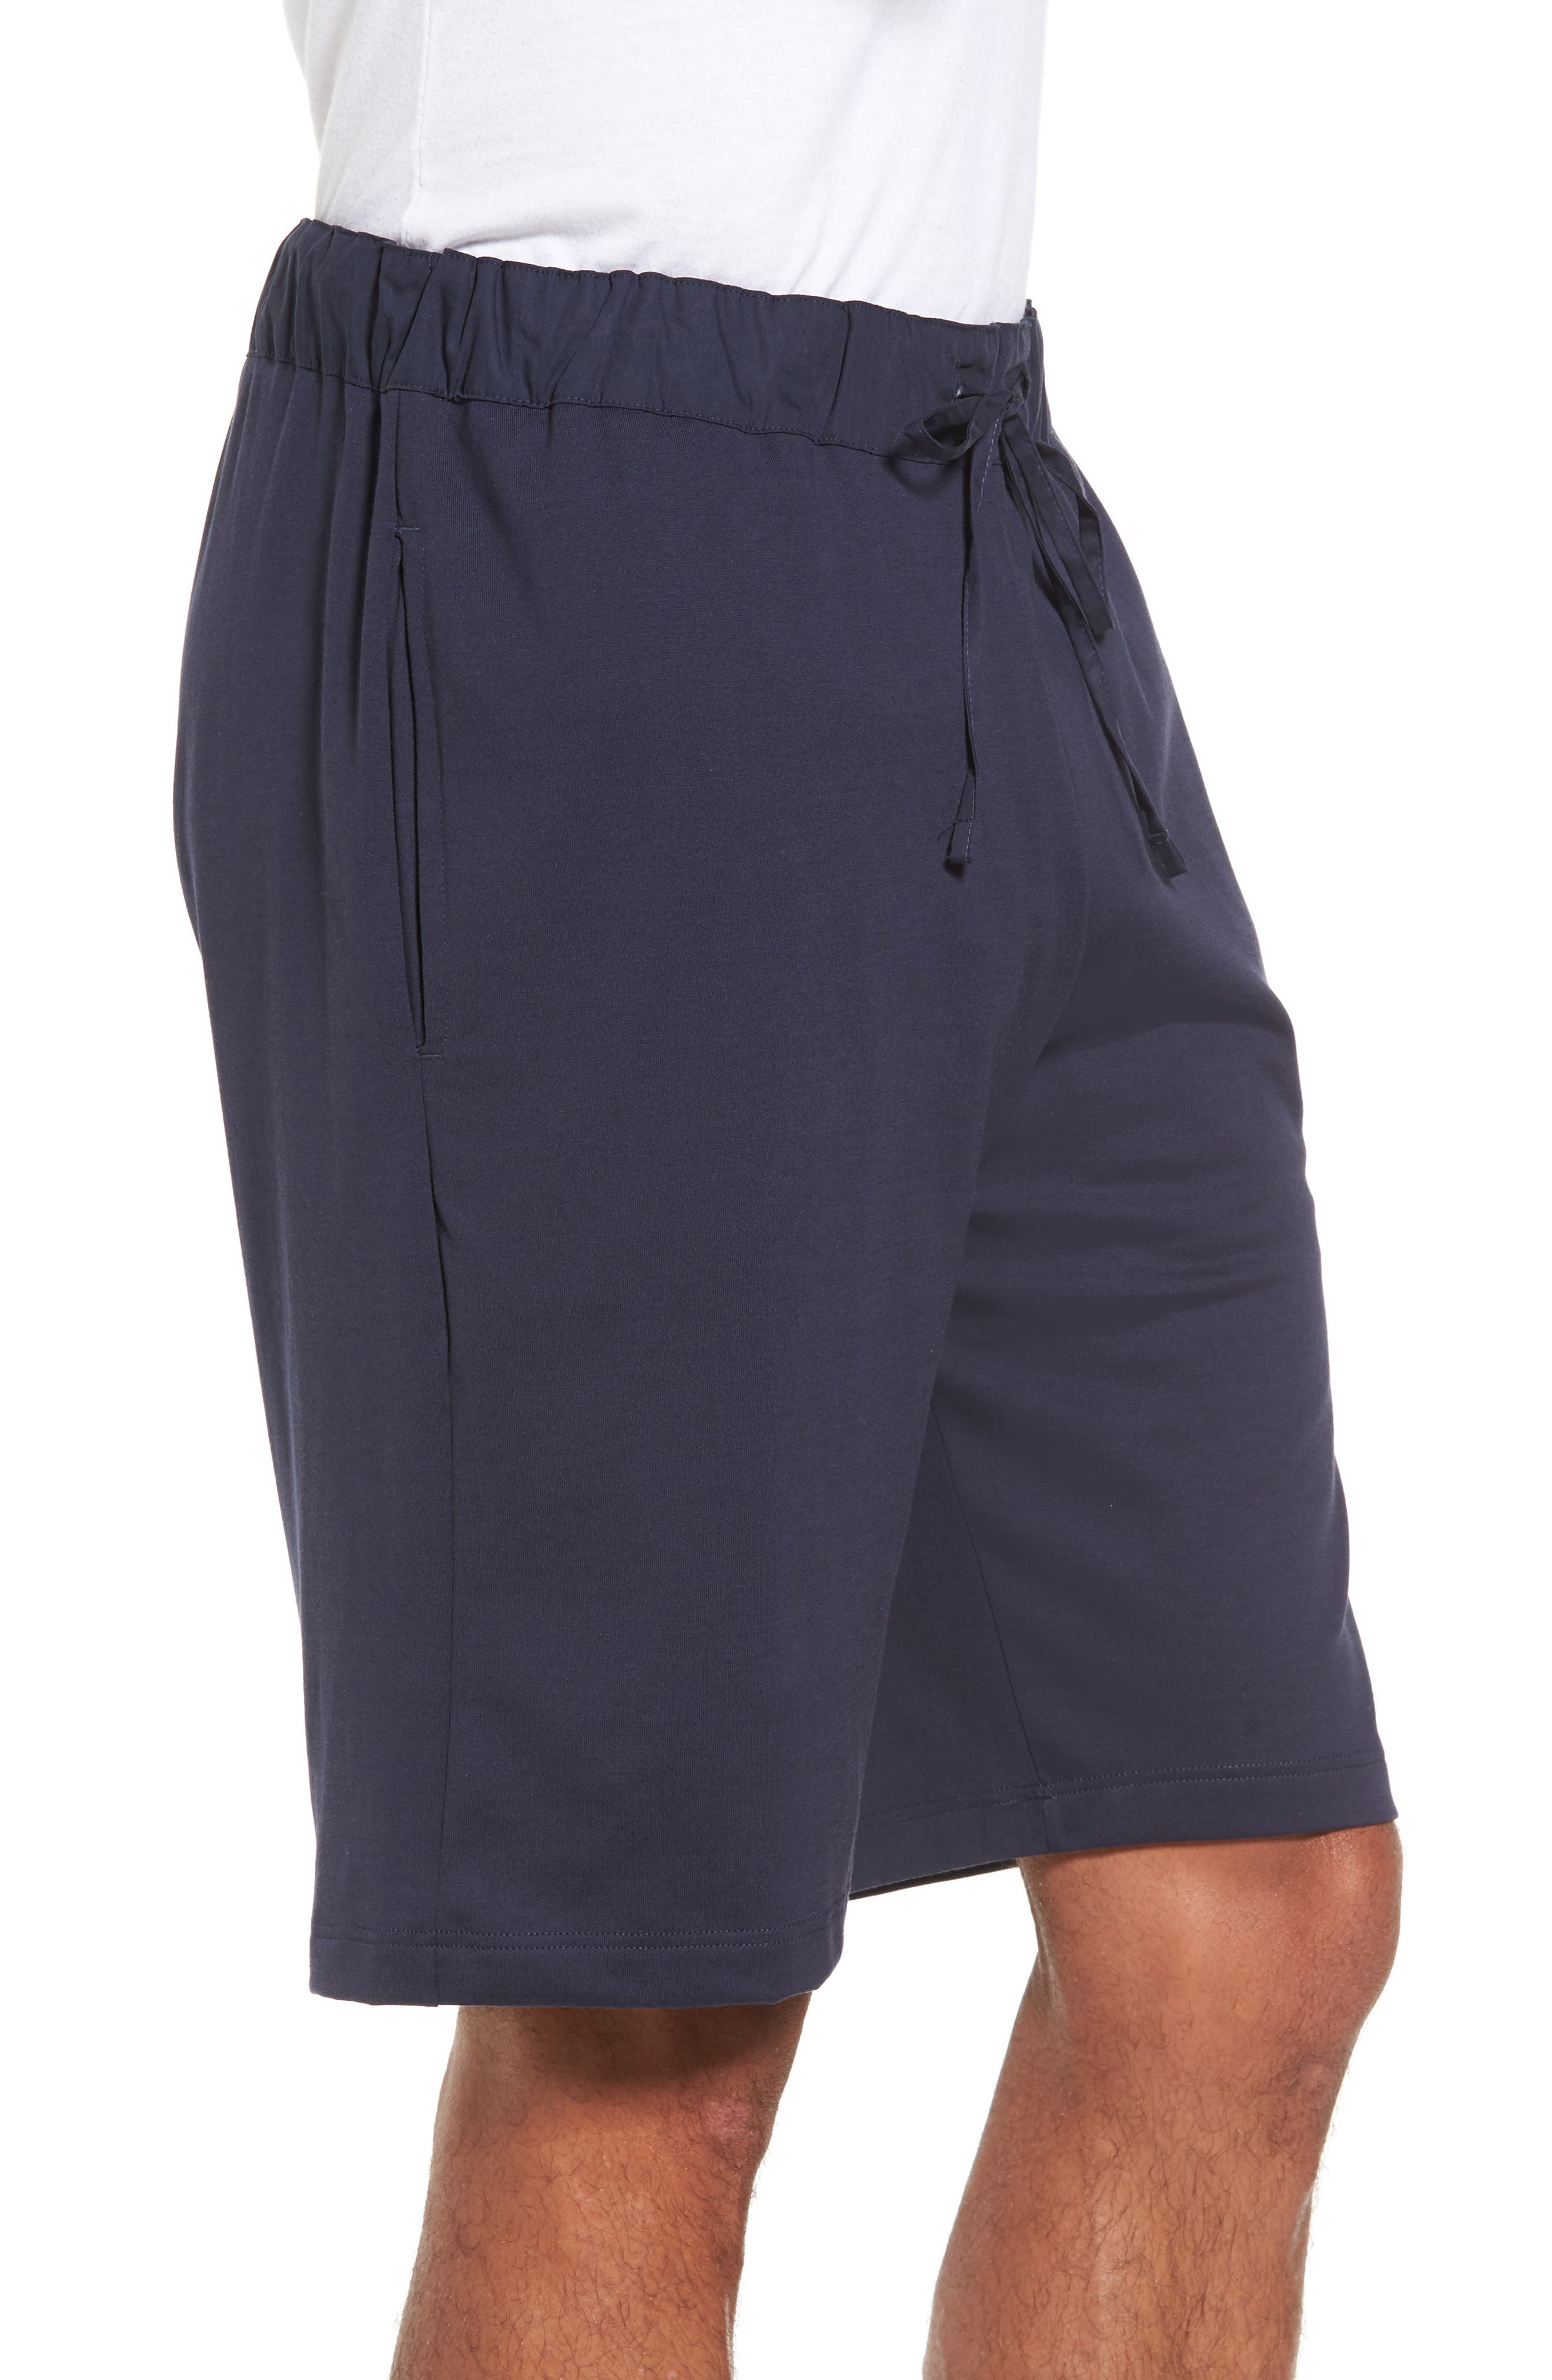 Night & Day Knit Shorts,                             Alternate thumbnail 3, color,                             BLACK IRIS